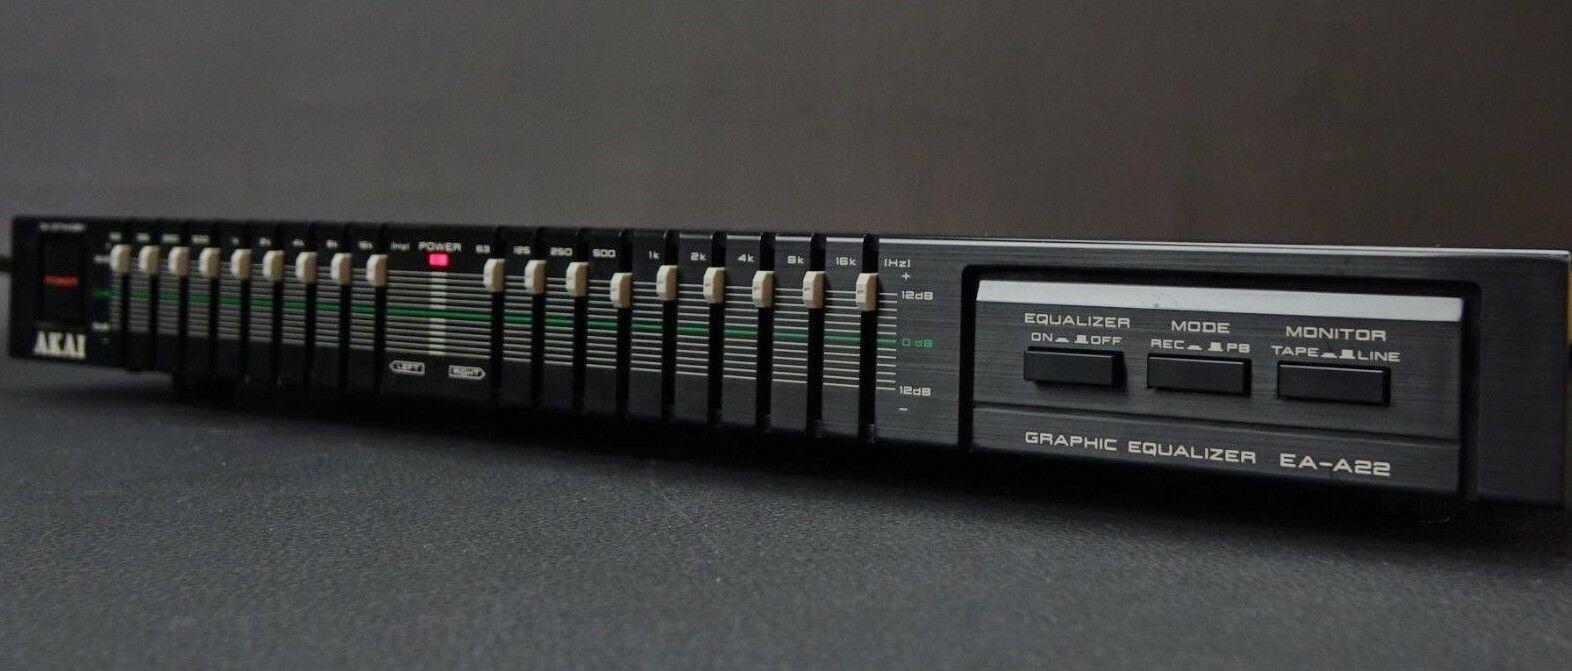 Akai EA-A22 - 9 Band Stereo Graphic Equalizer - EQ | Audio